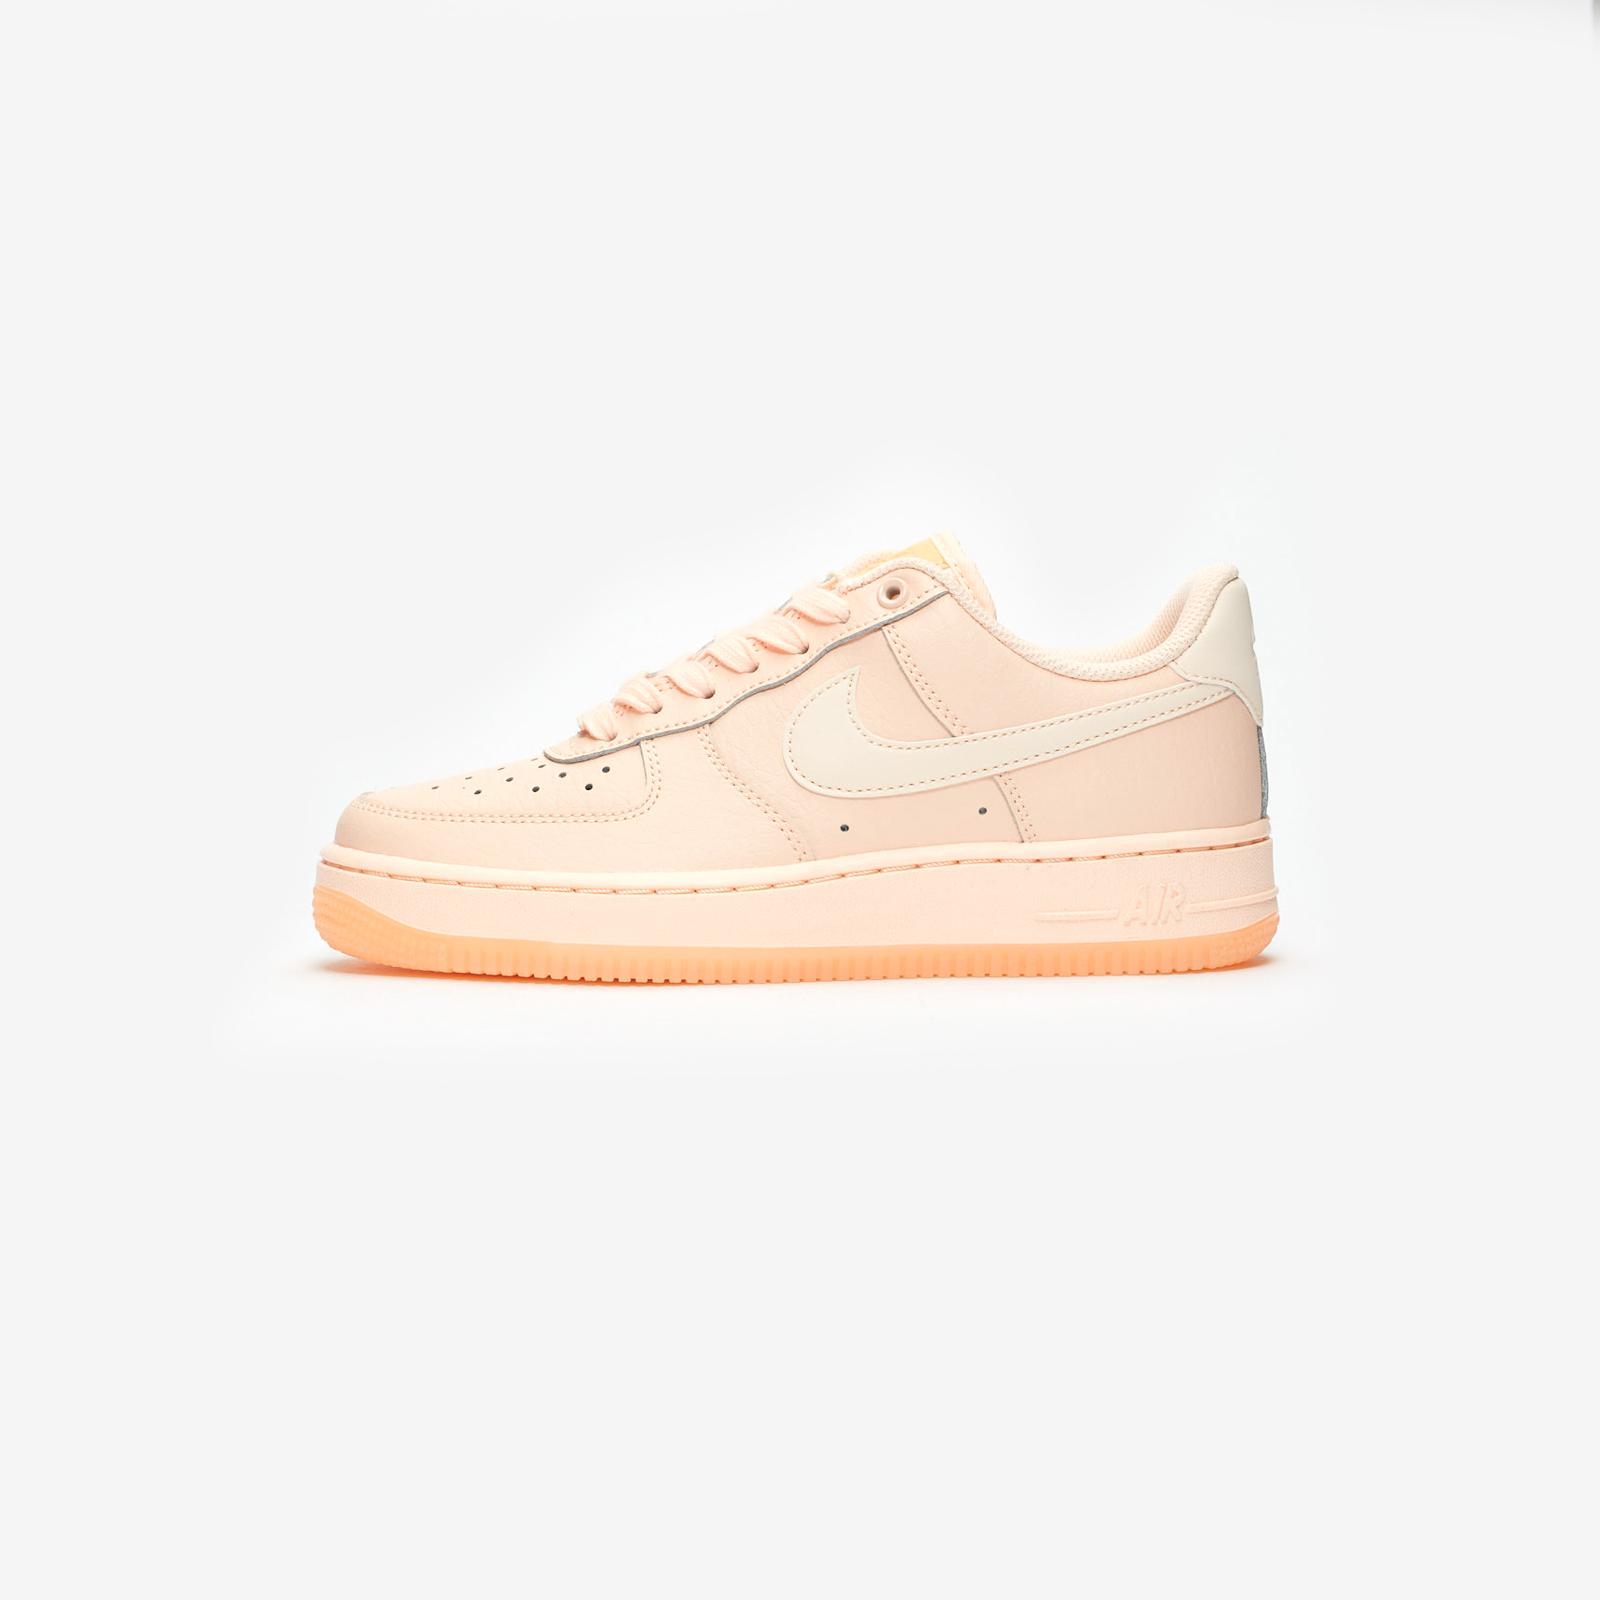 newest 71207 7affc Nike Wmns Air Force 1 07 Essential - Ao2132-800 - Sneakersnstuff   sneakers    streetwear online since 1999